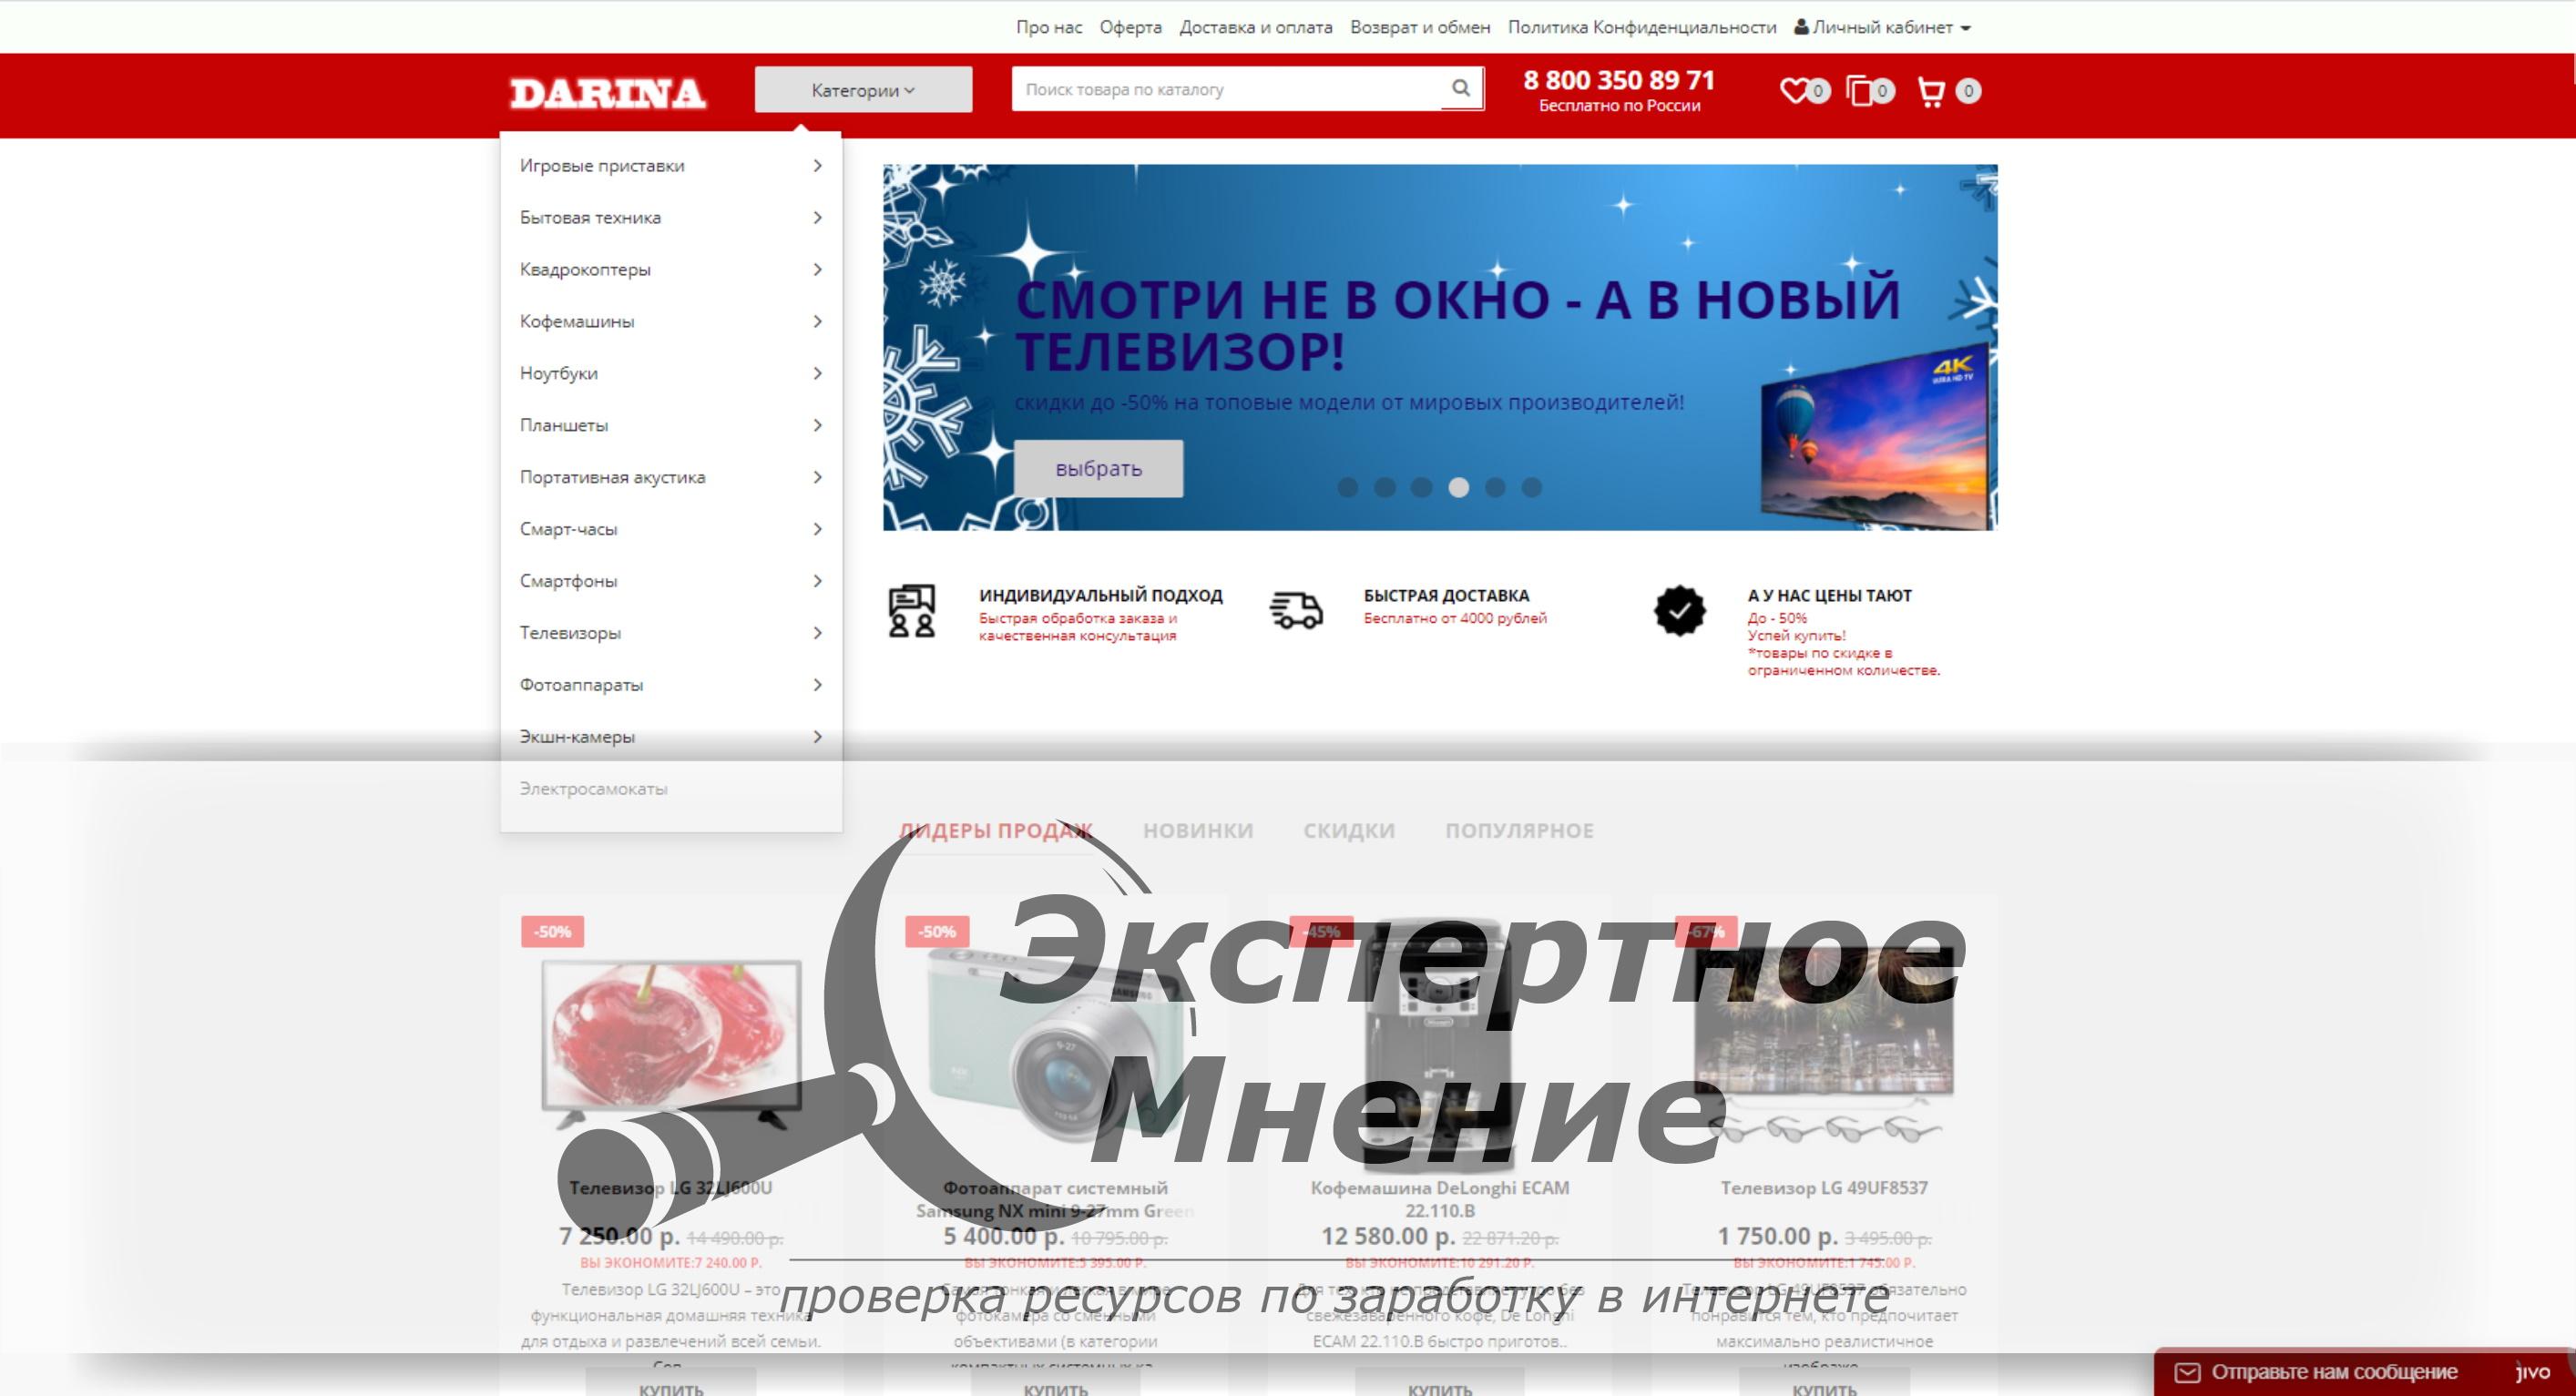 Darina интернет-магазин